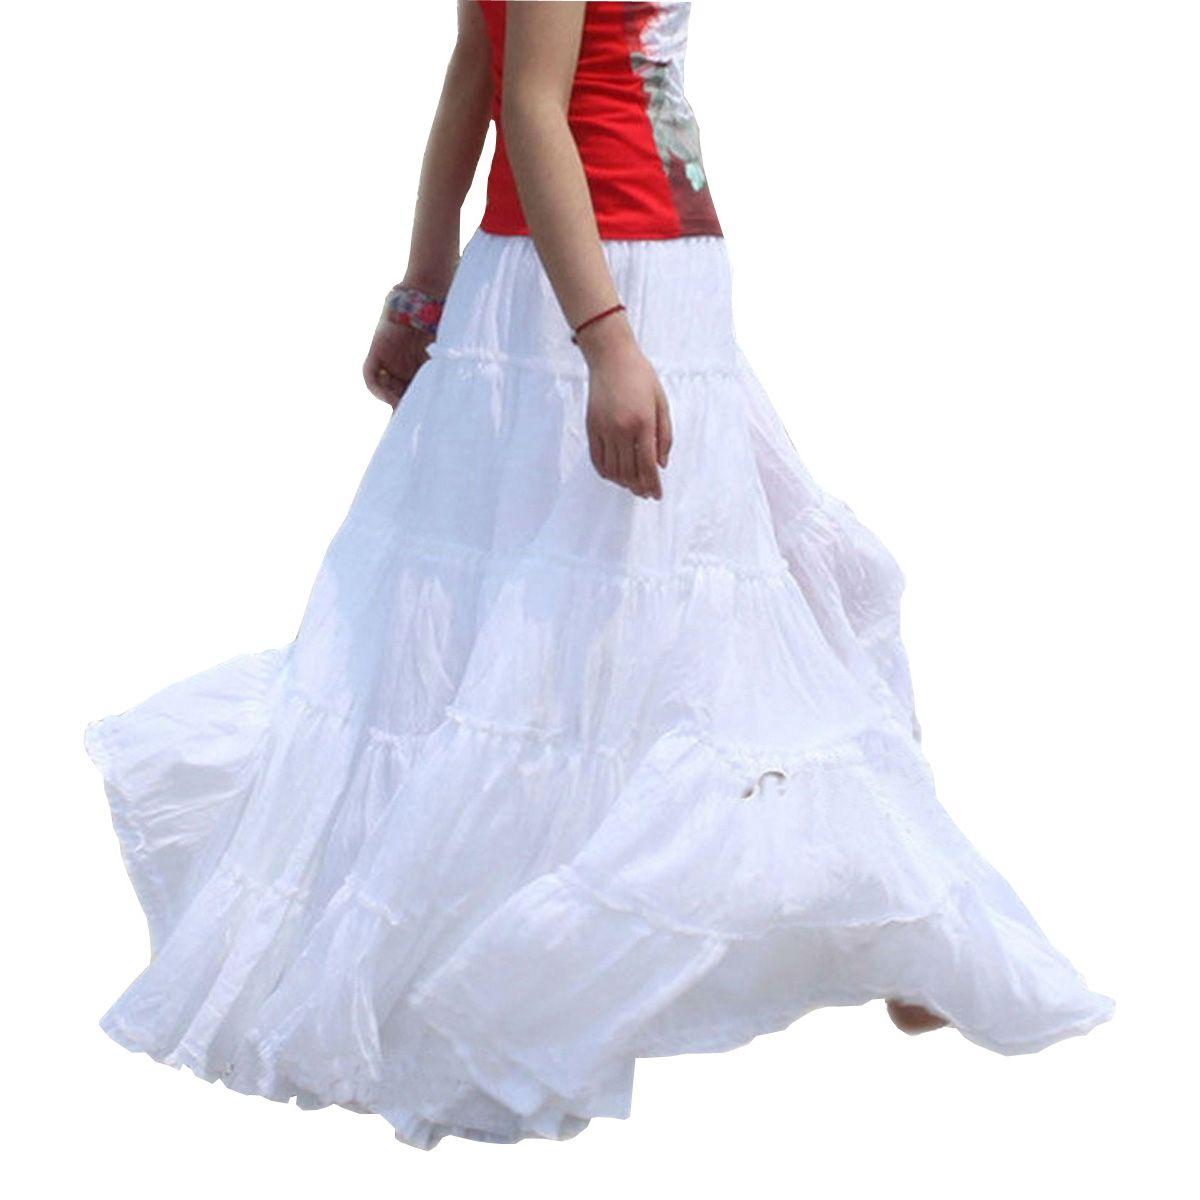 103c020607 Summer 100% Cotton Elegant Stitching Casual Span Dancing White Female Long  Skirt / BOHO Bohemia Pleated Maxi Skirts for Women